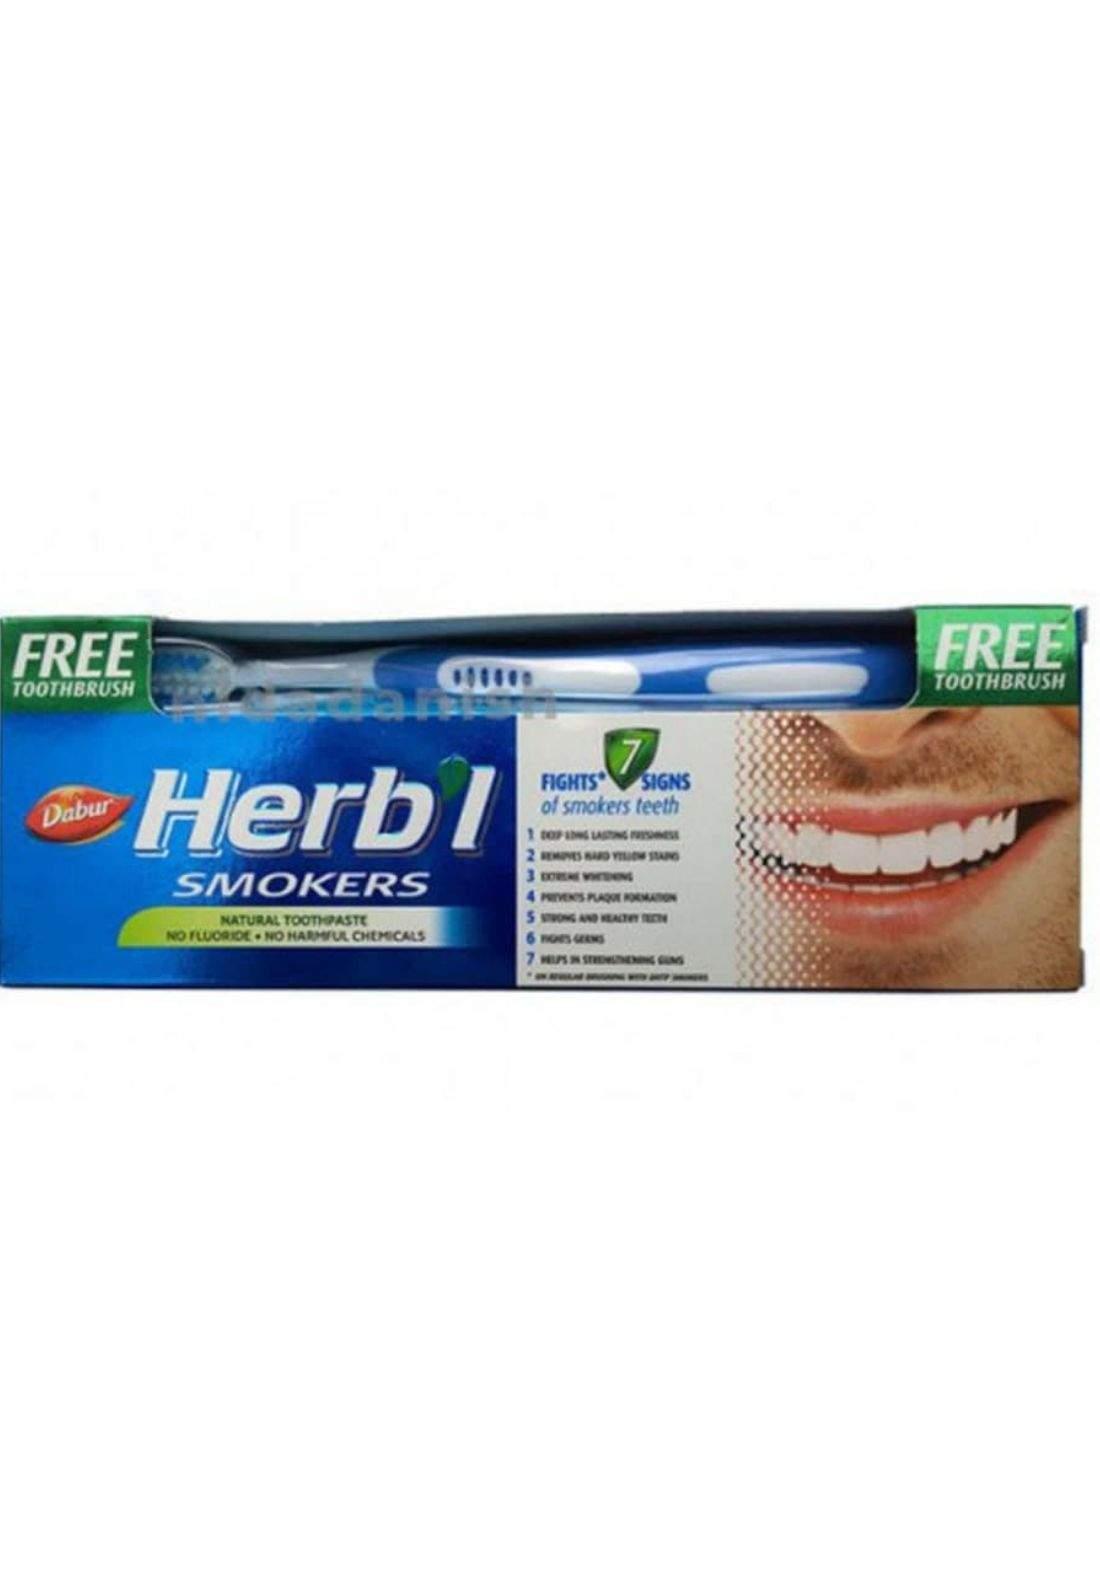 Dabur herbl tooth paste 150g دابر معجون اسنان